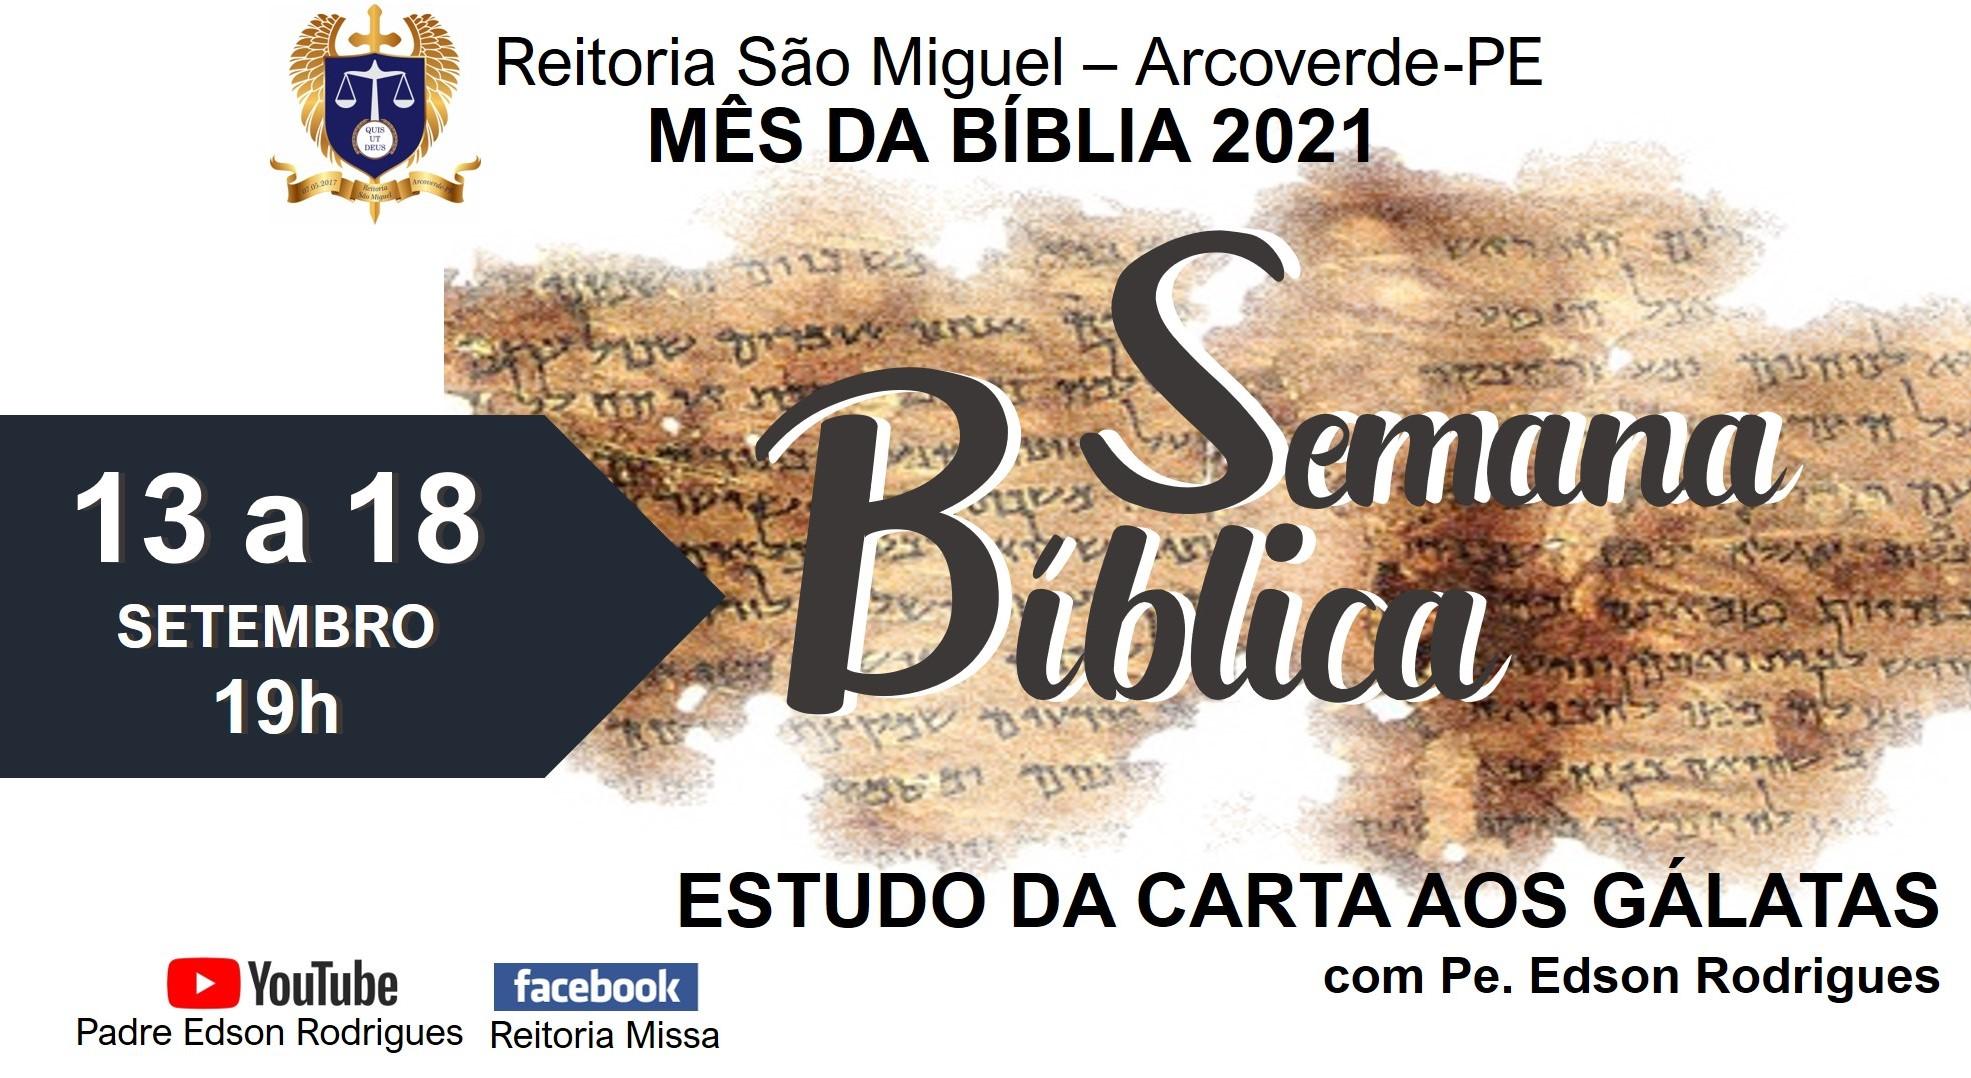 BANNER SÃO MIGUEL